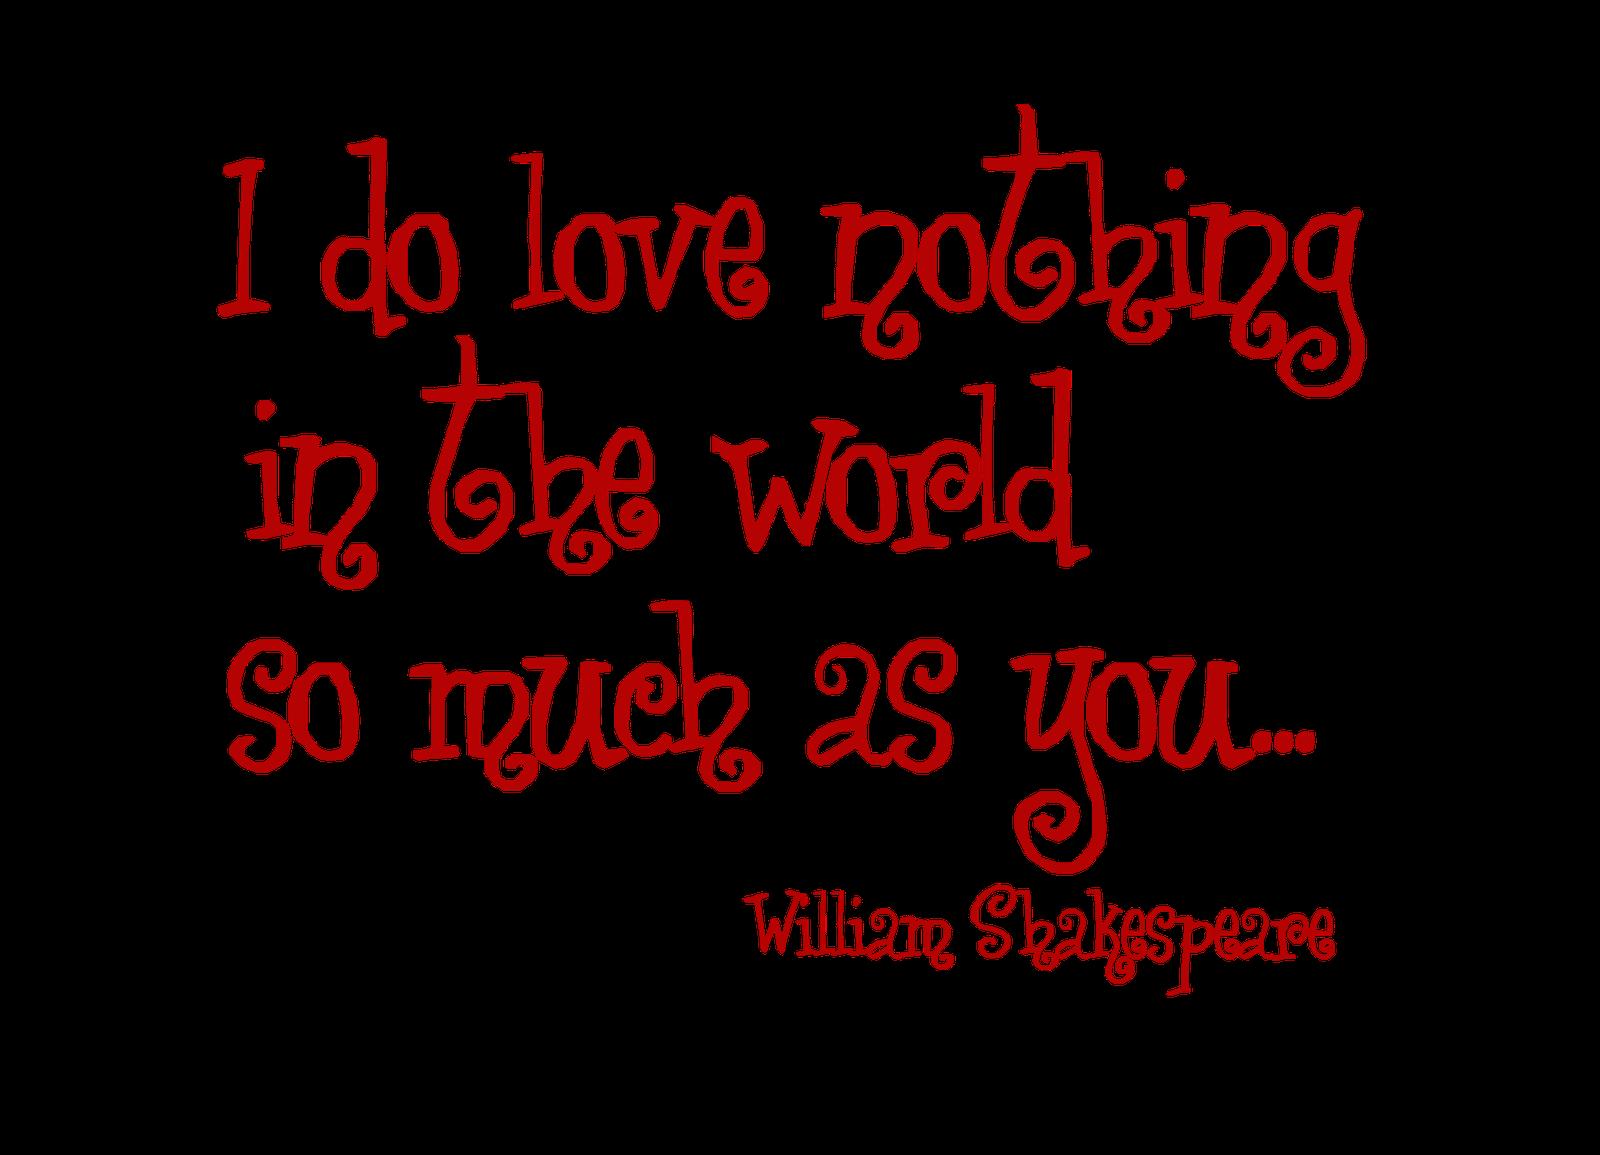 410 Romantic Wallpaper With Quotes Hd Terbaik